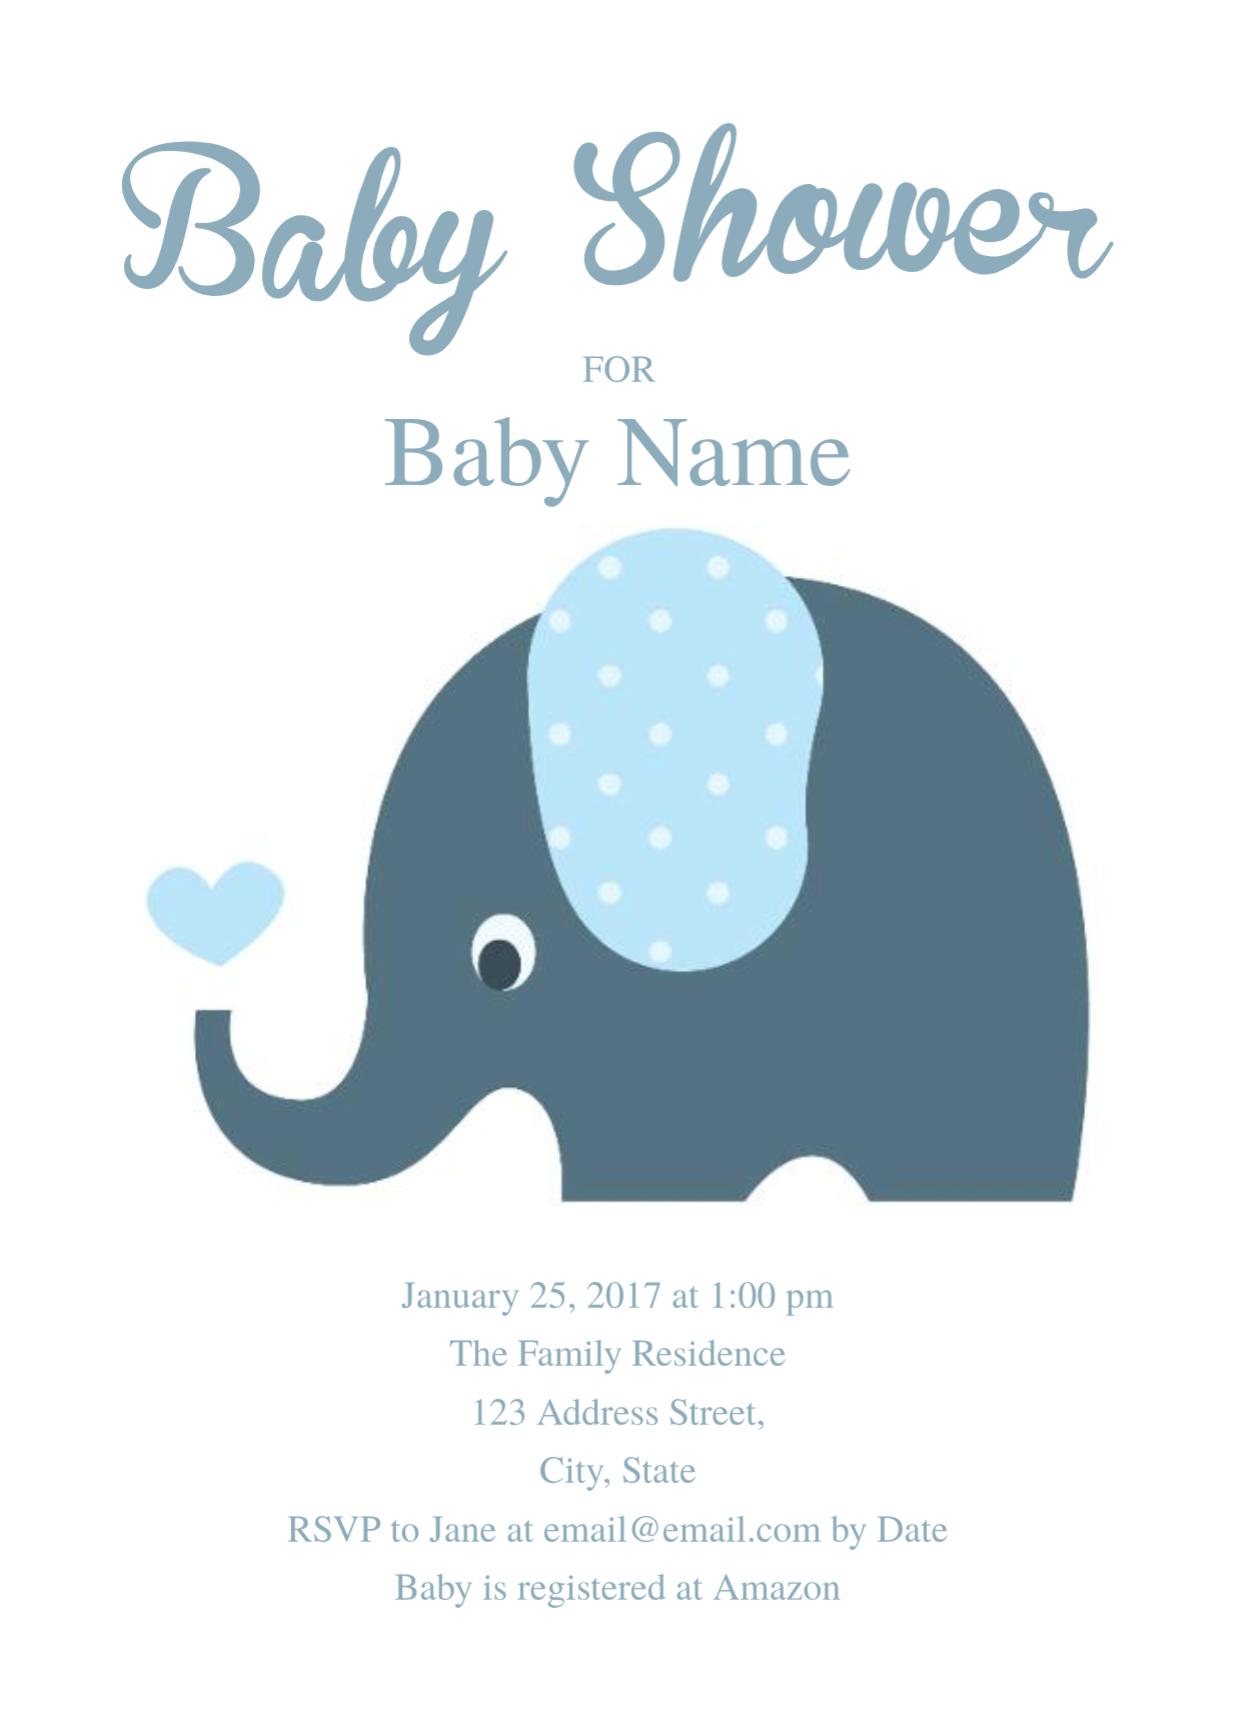 Cute Elephant Baby Shower Invitation Template   Free Invitation - Free Printable Baby Elephant Template